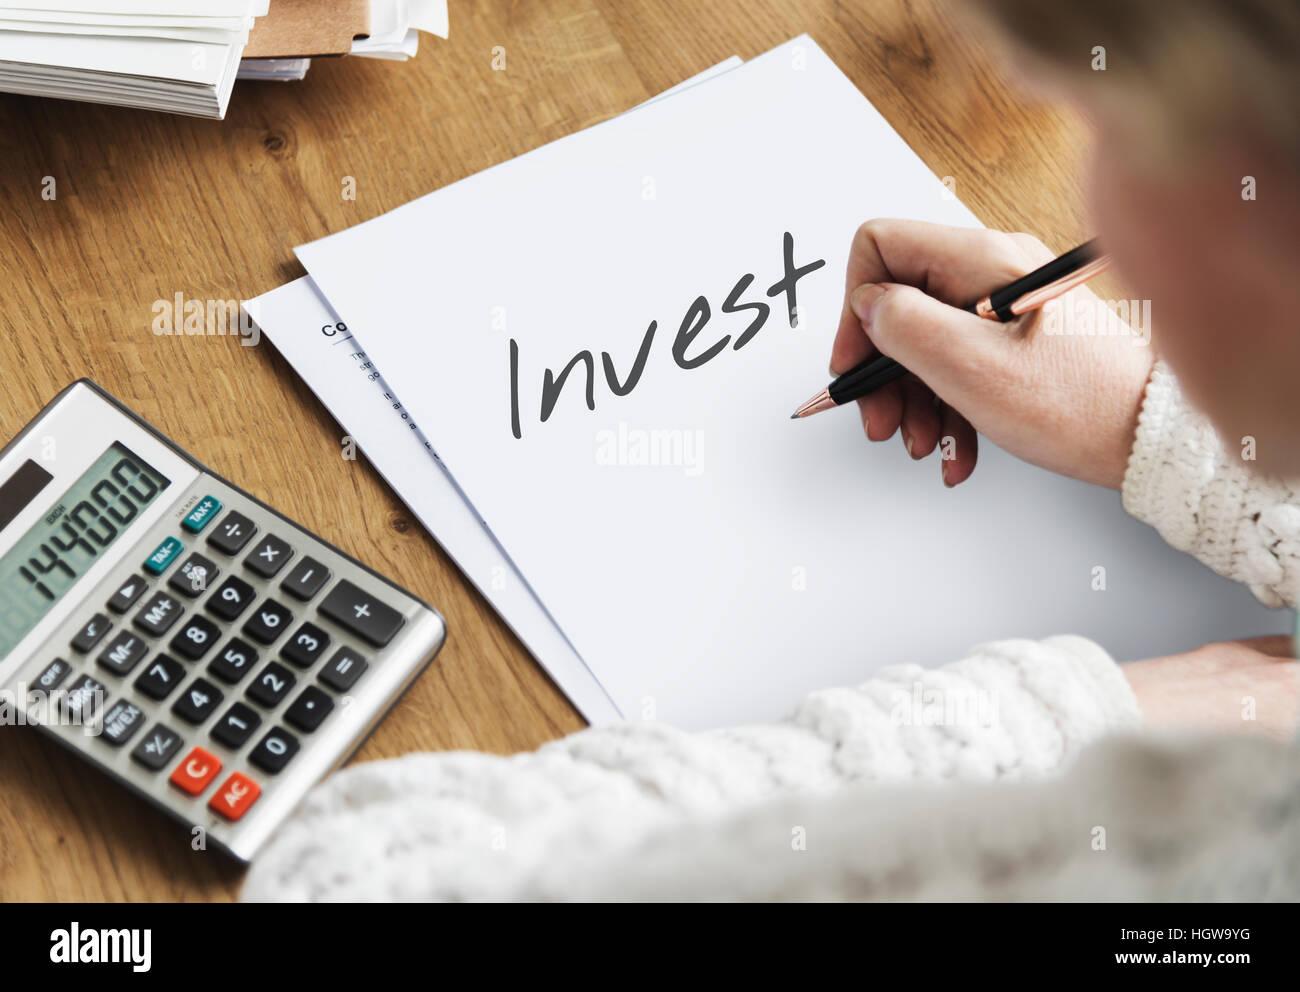 Where to Invest Entrepreneur Investment Financial Risk Assessment Concept - Stock Image